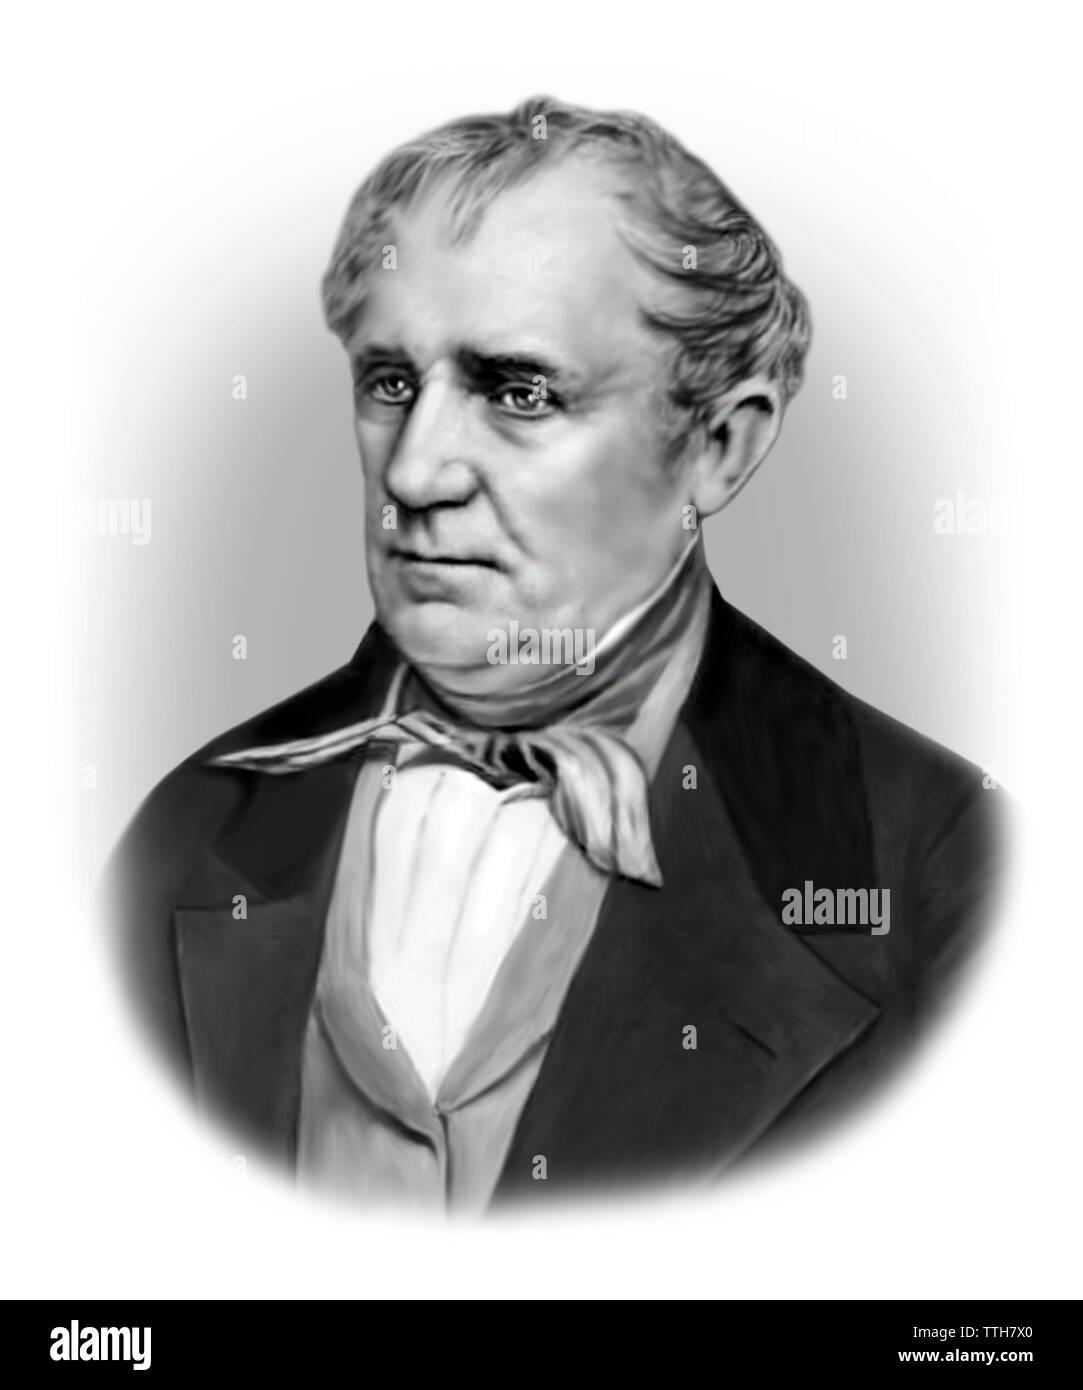 James Fennimore Cooper 1789-1851 American Writer - Stock Image